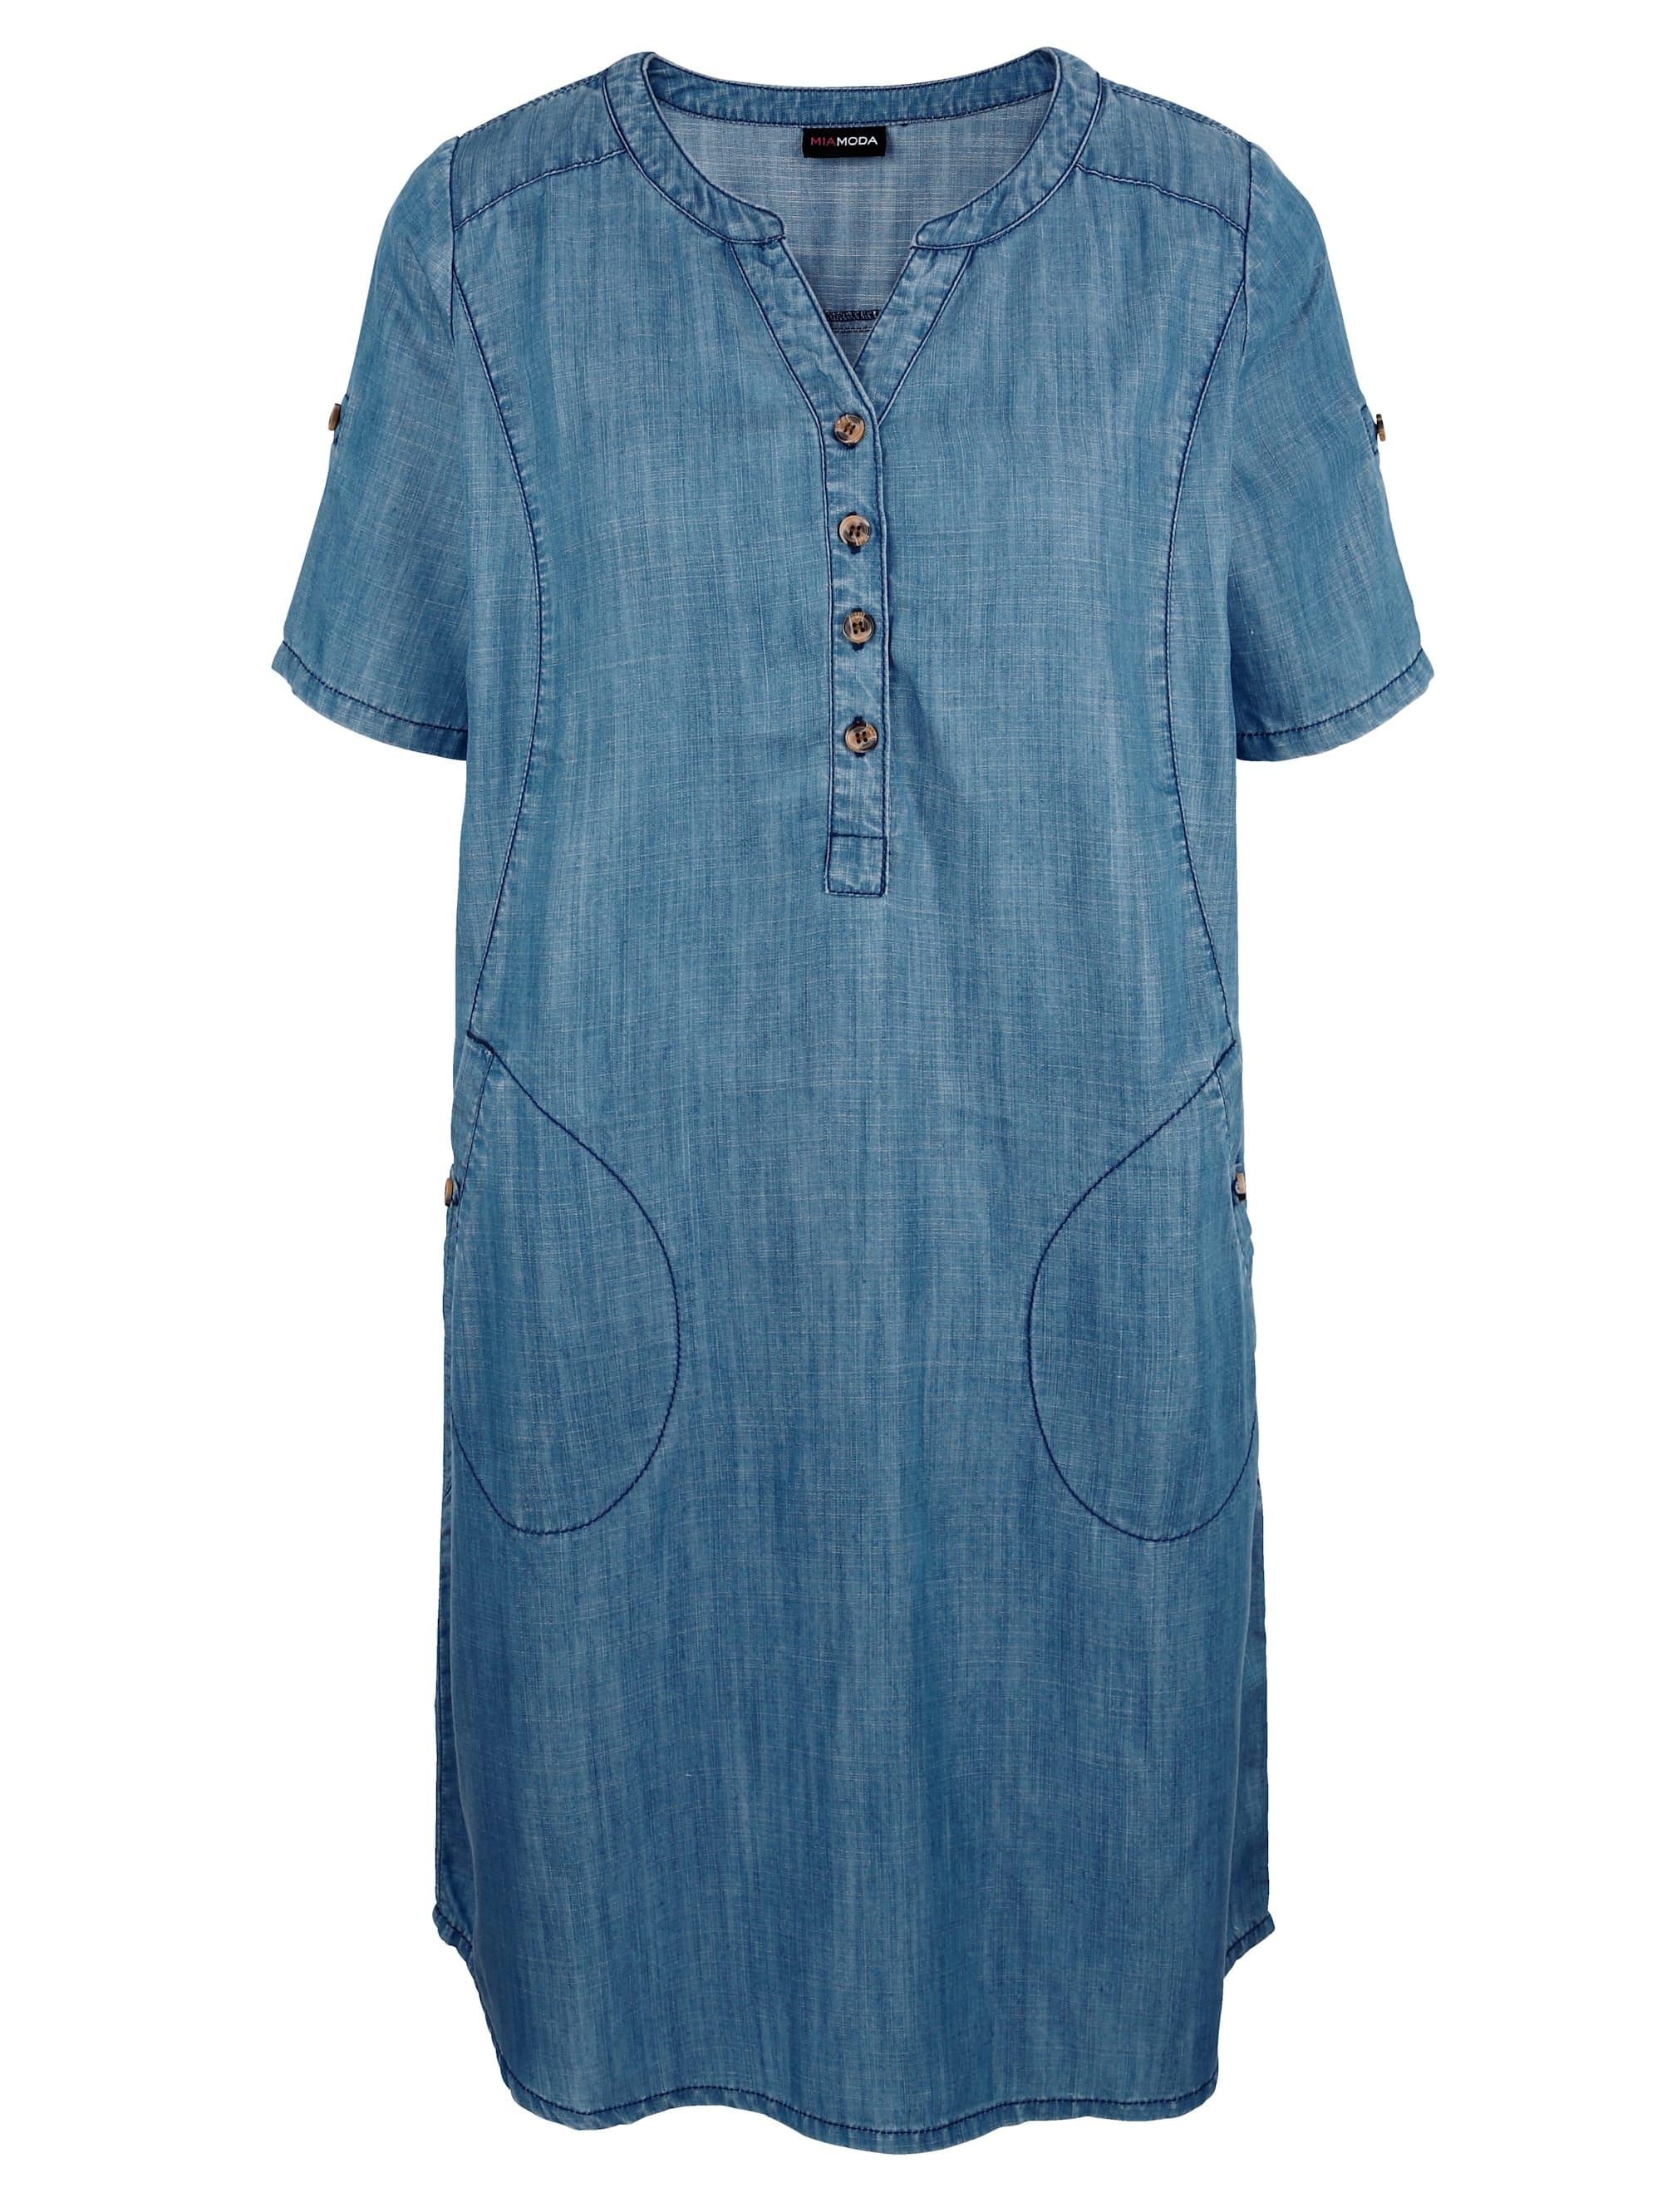 miamoda -  Sommerkleid